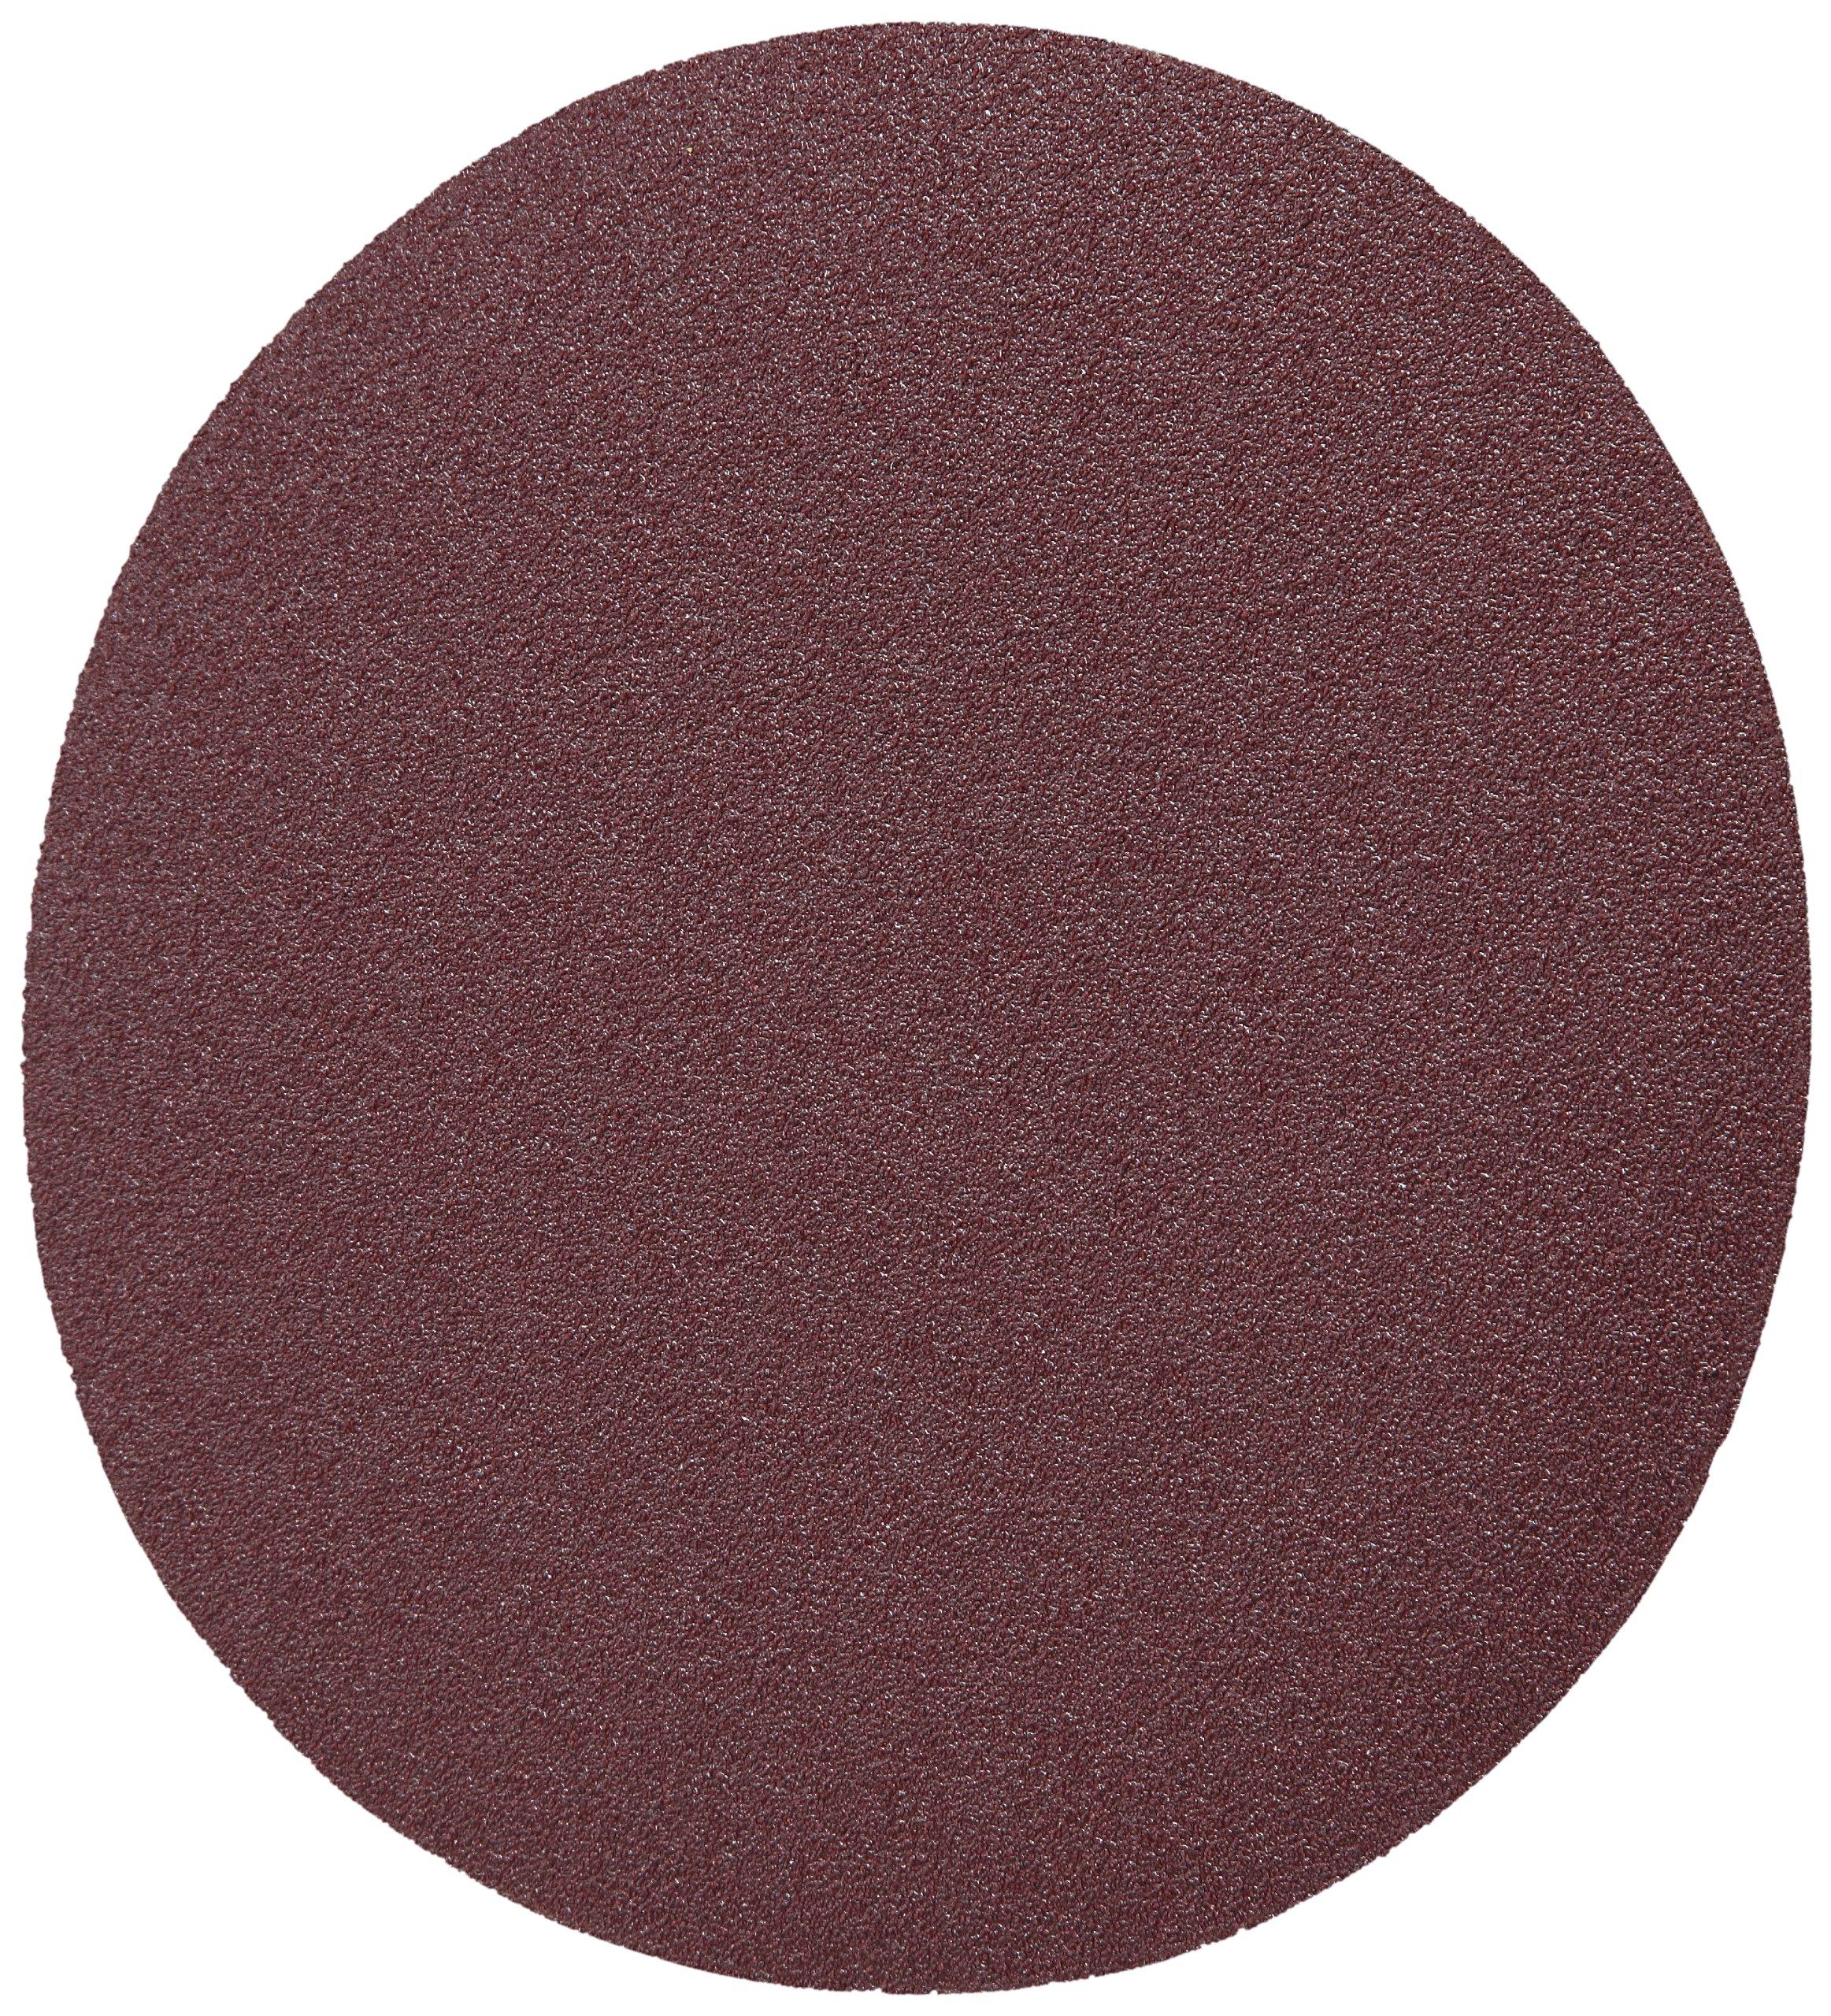 3M Stikit Cloth Disc 202DZ, J-Weight Cloth, PSA Attachment, Aluminum Oxide, 6'' Diameter, P120 Grit (Pack of 50)